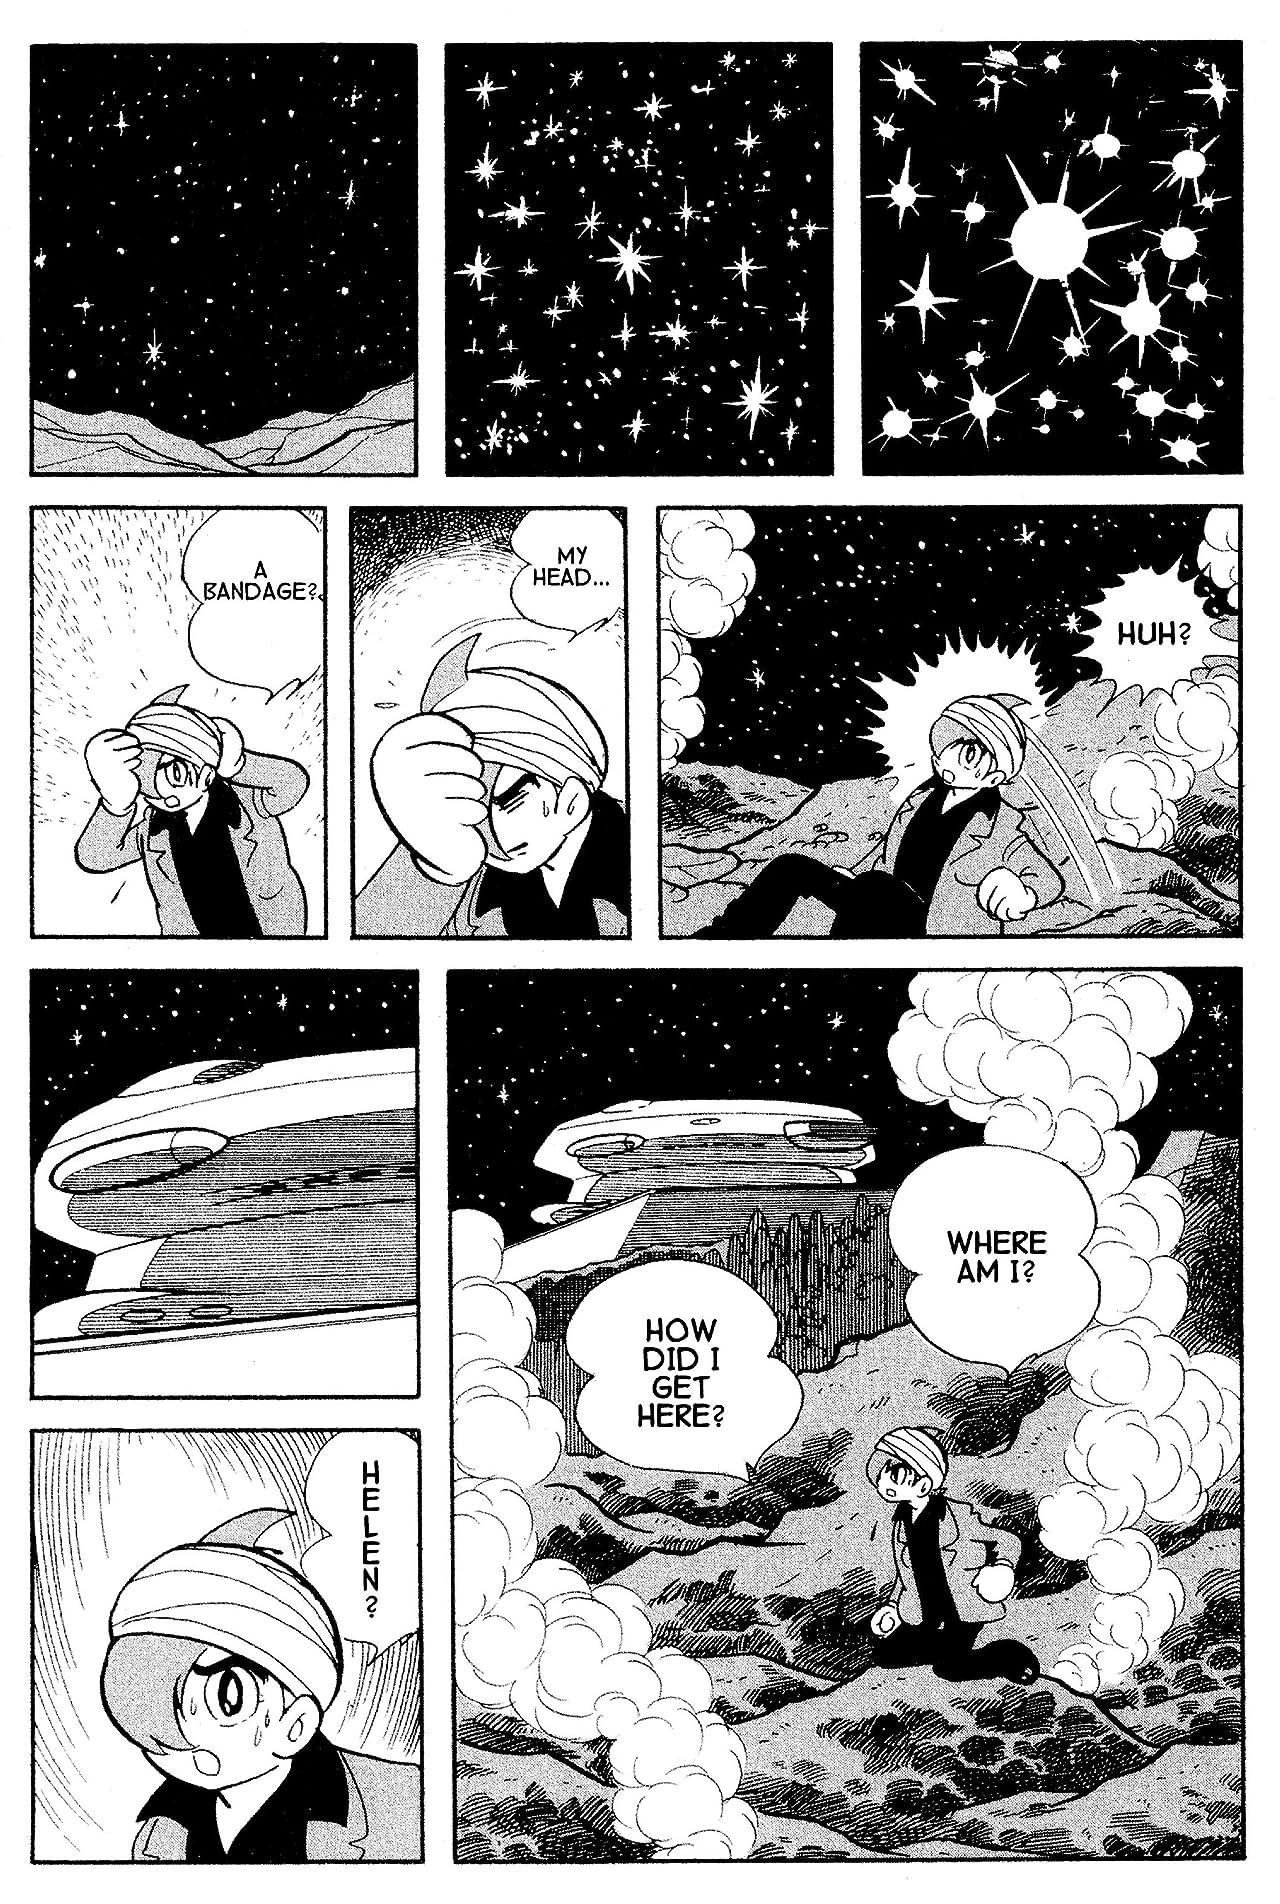 Cyborg 009 Vol. 9: Preview